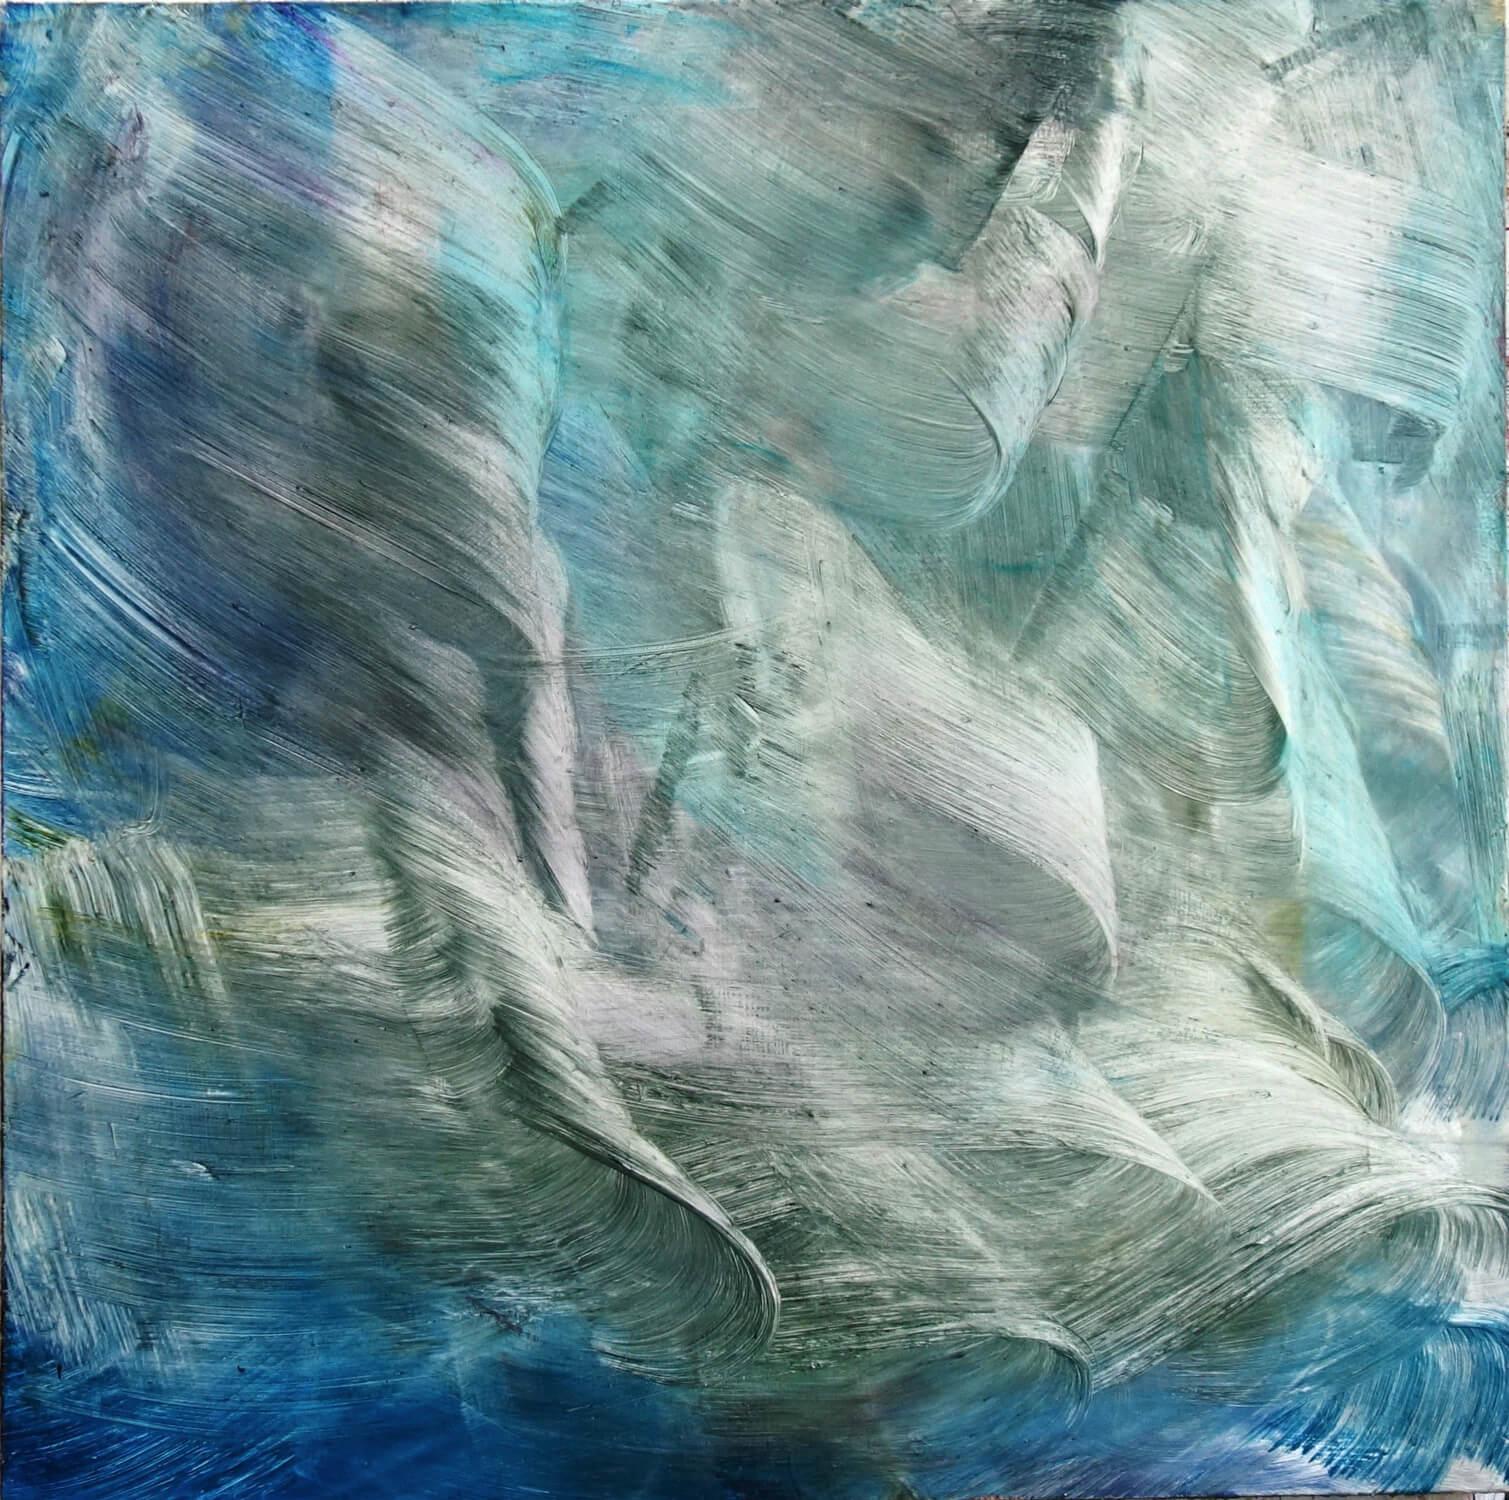 Isa Dahl / als ob / 2019 / Öl auf Leinwand / 170 x 170 cm